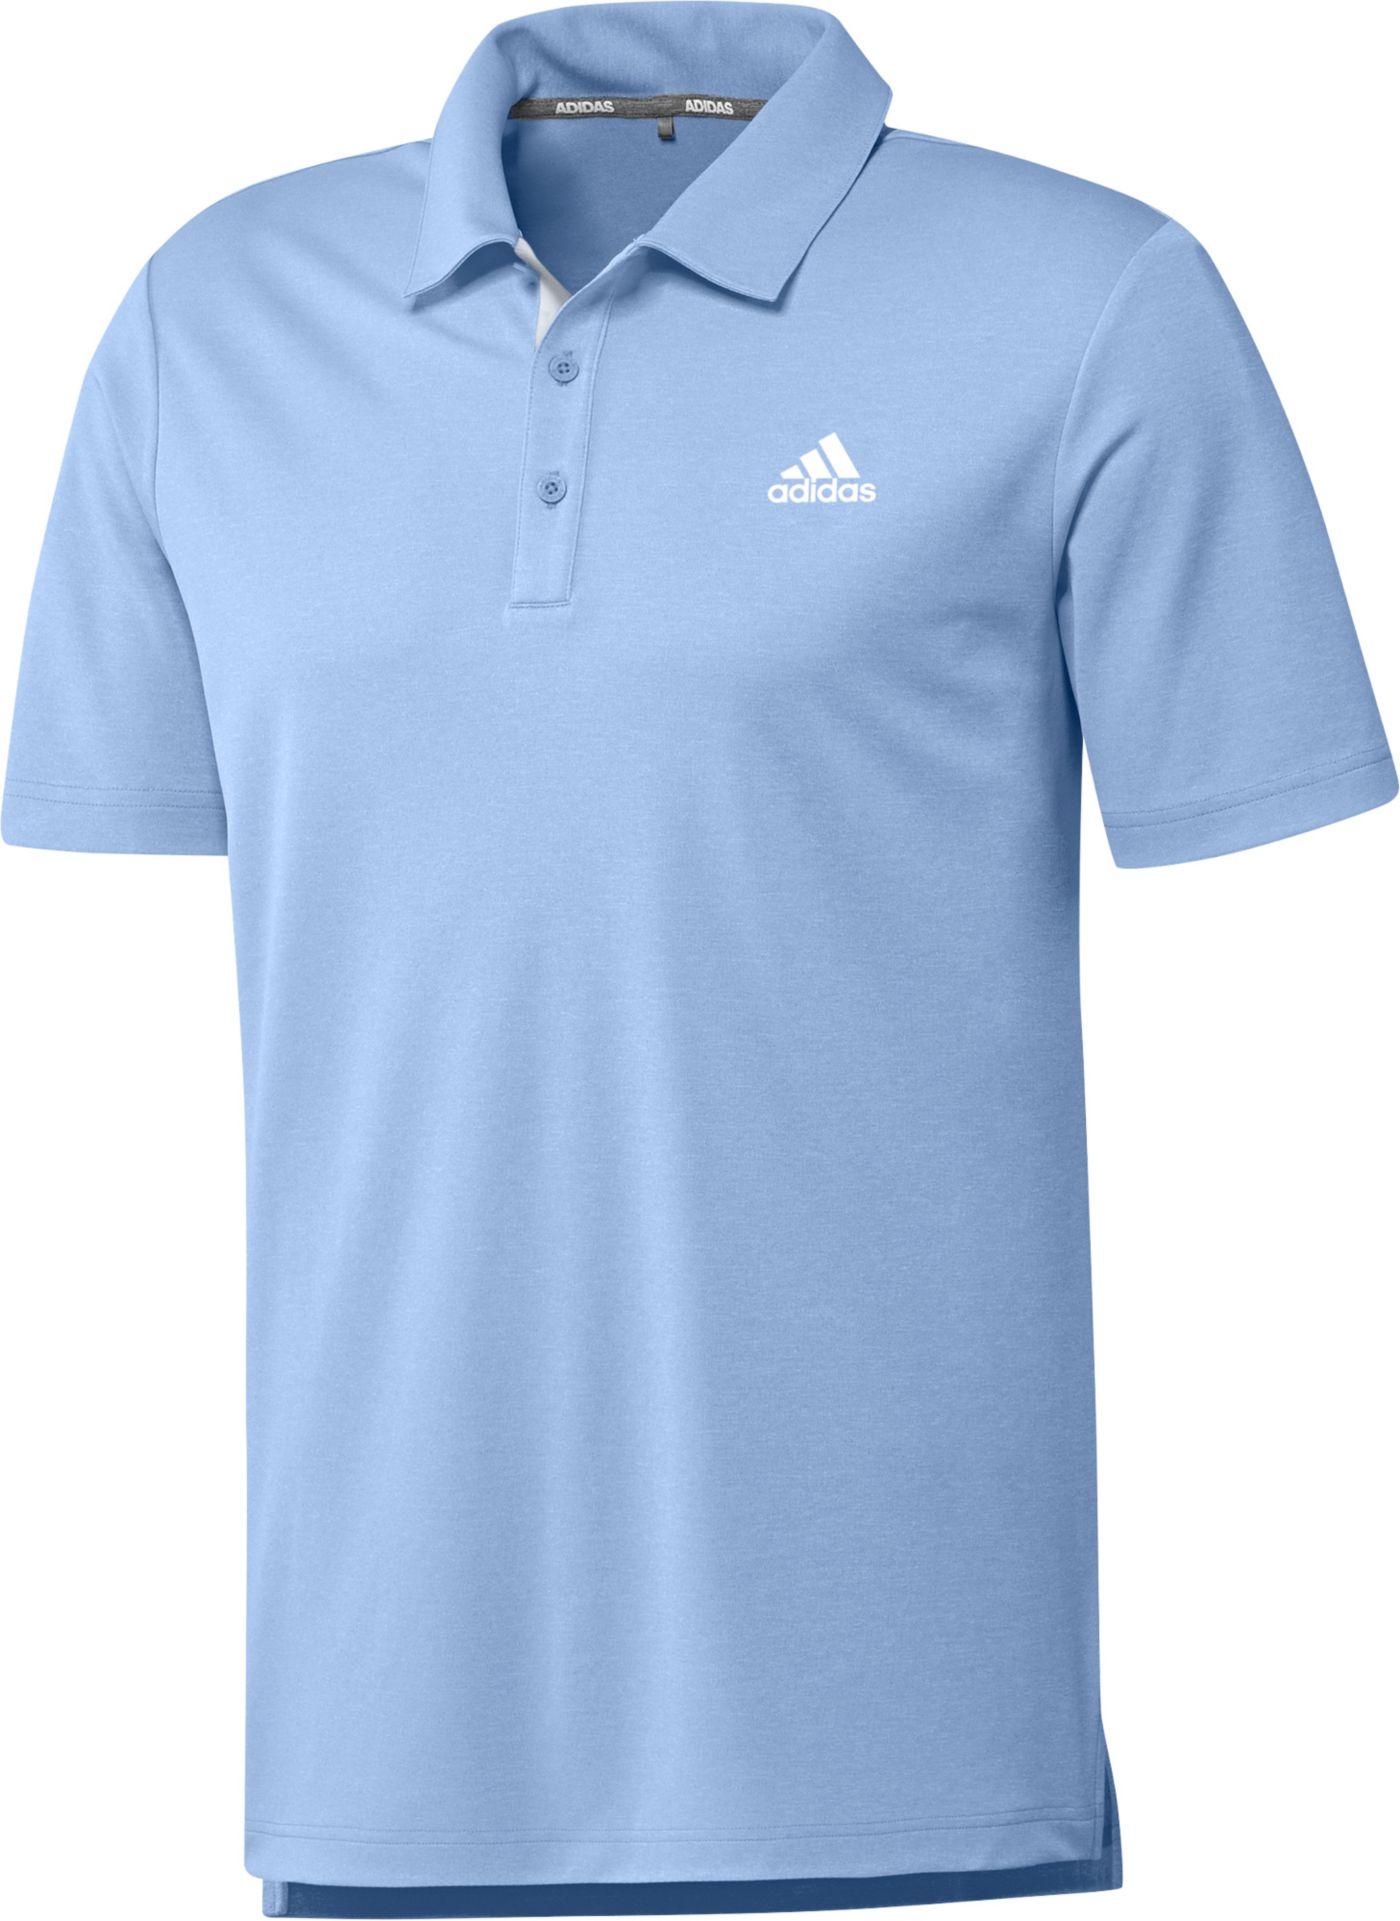 adidas Men's Drive Novelty Heather Golf Polo